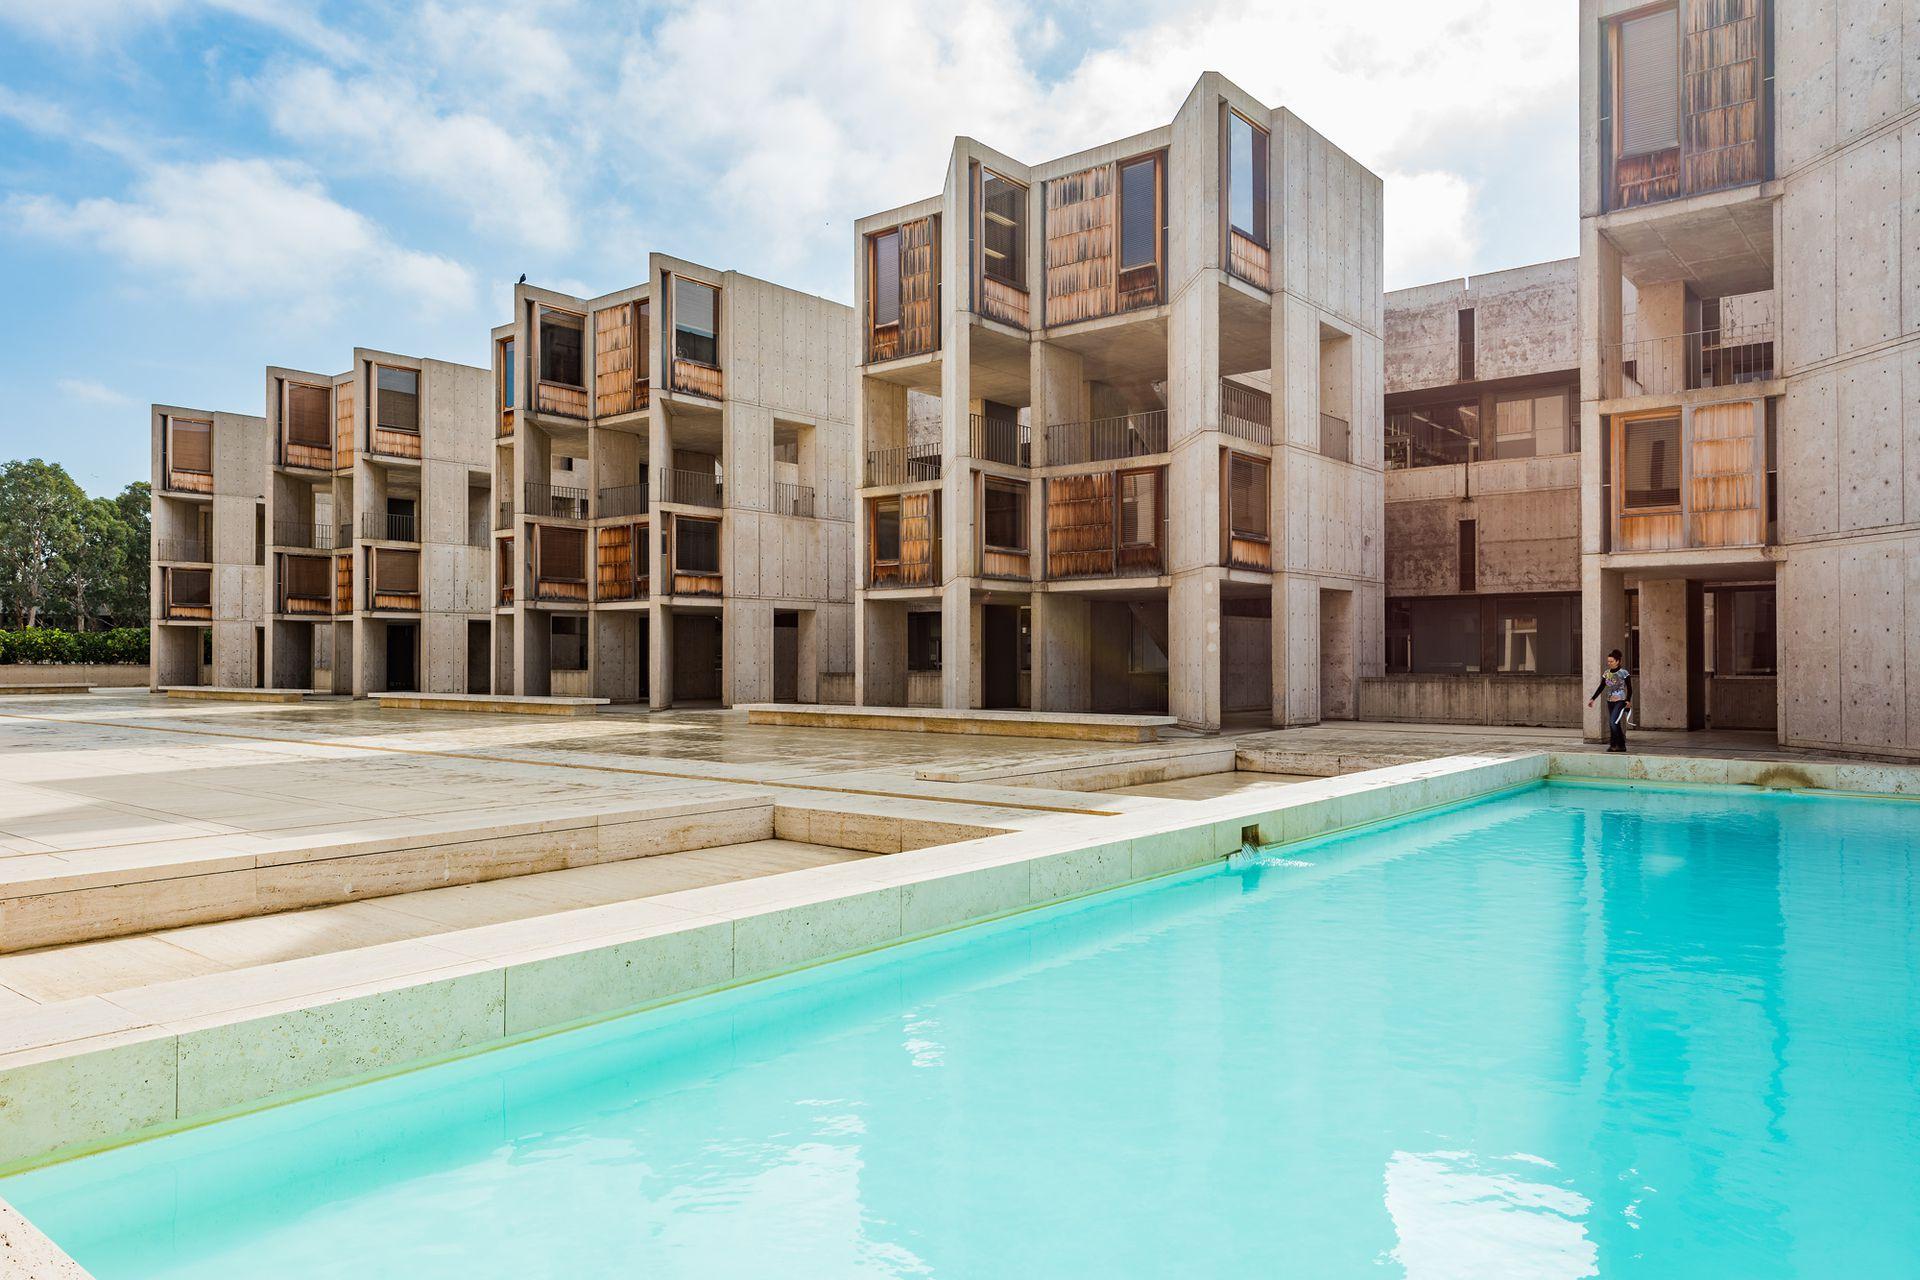 Salk Institute, de Louis Kahn